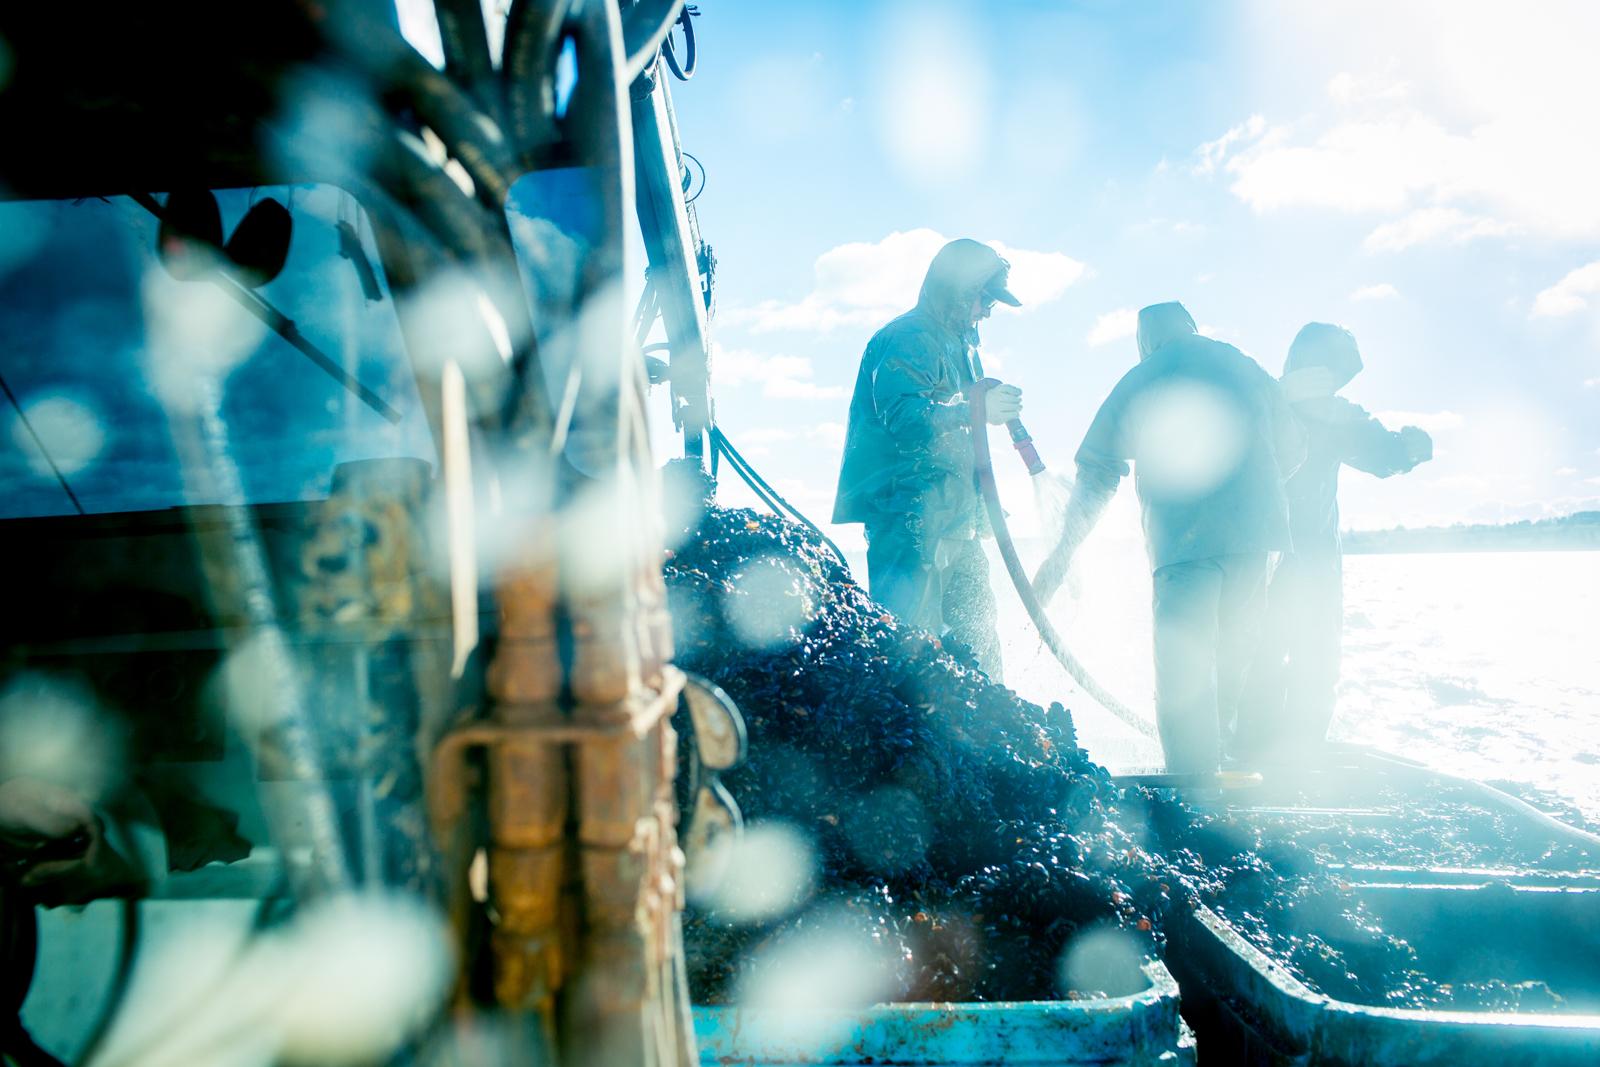 Mussel Harvesting